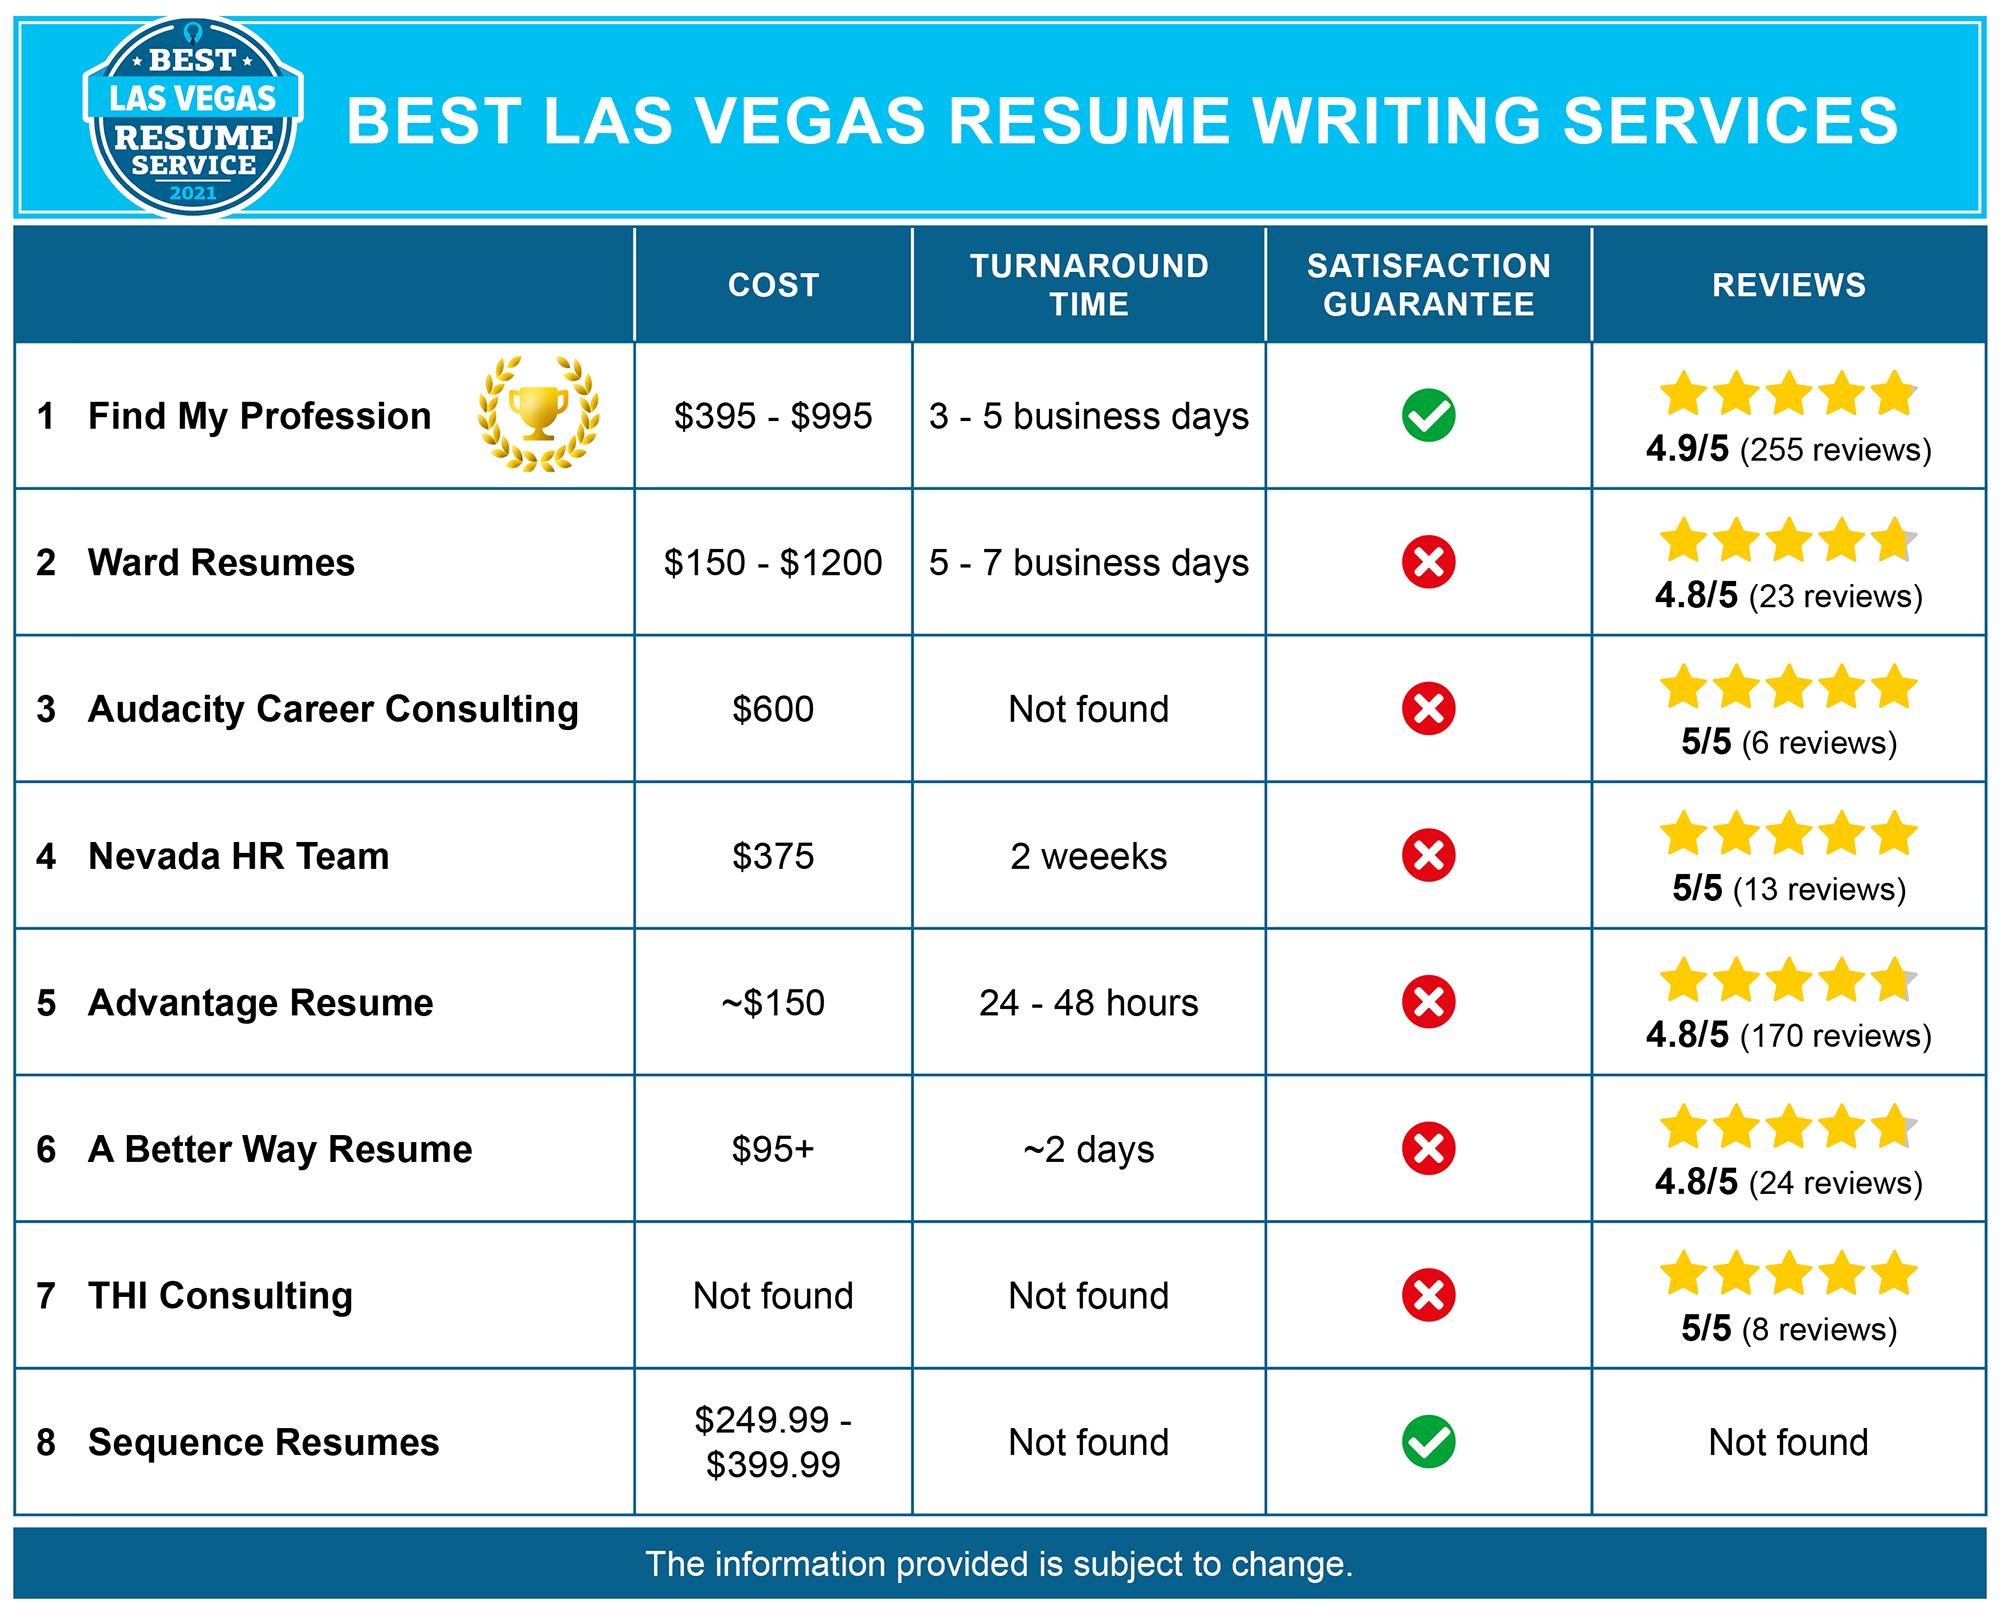 Best Las Vegas Resume Writing Services